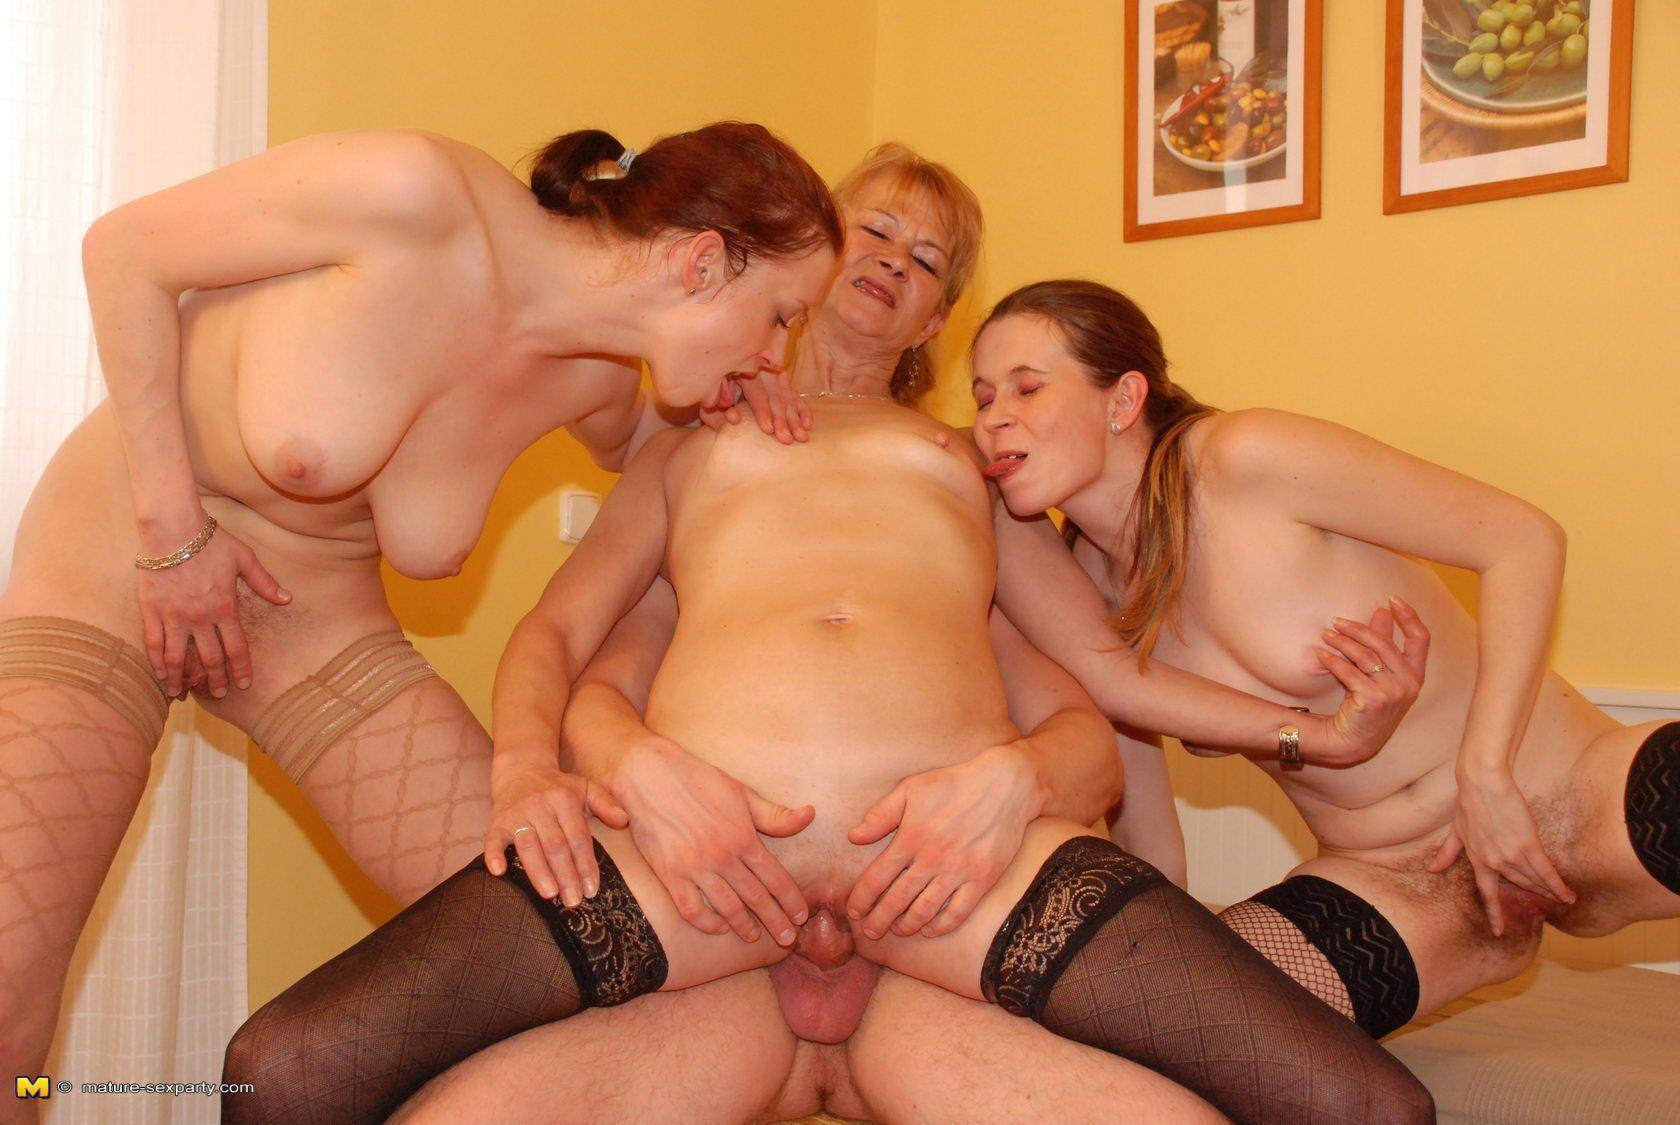 Mature adult parties